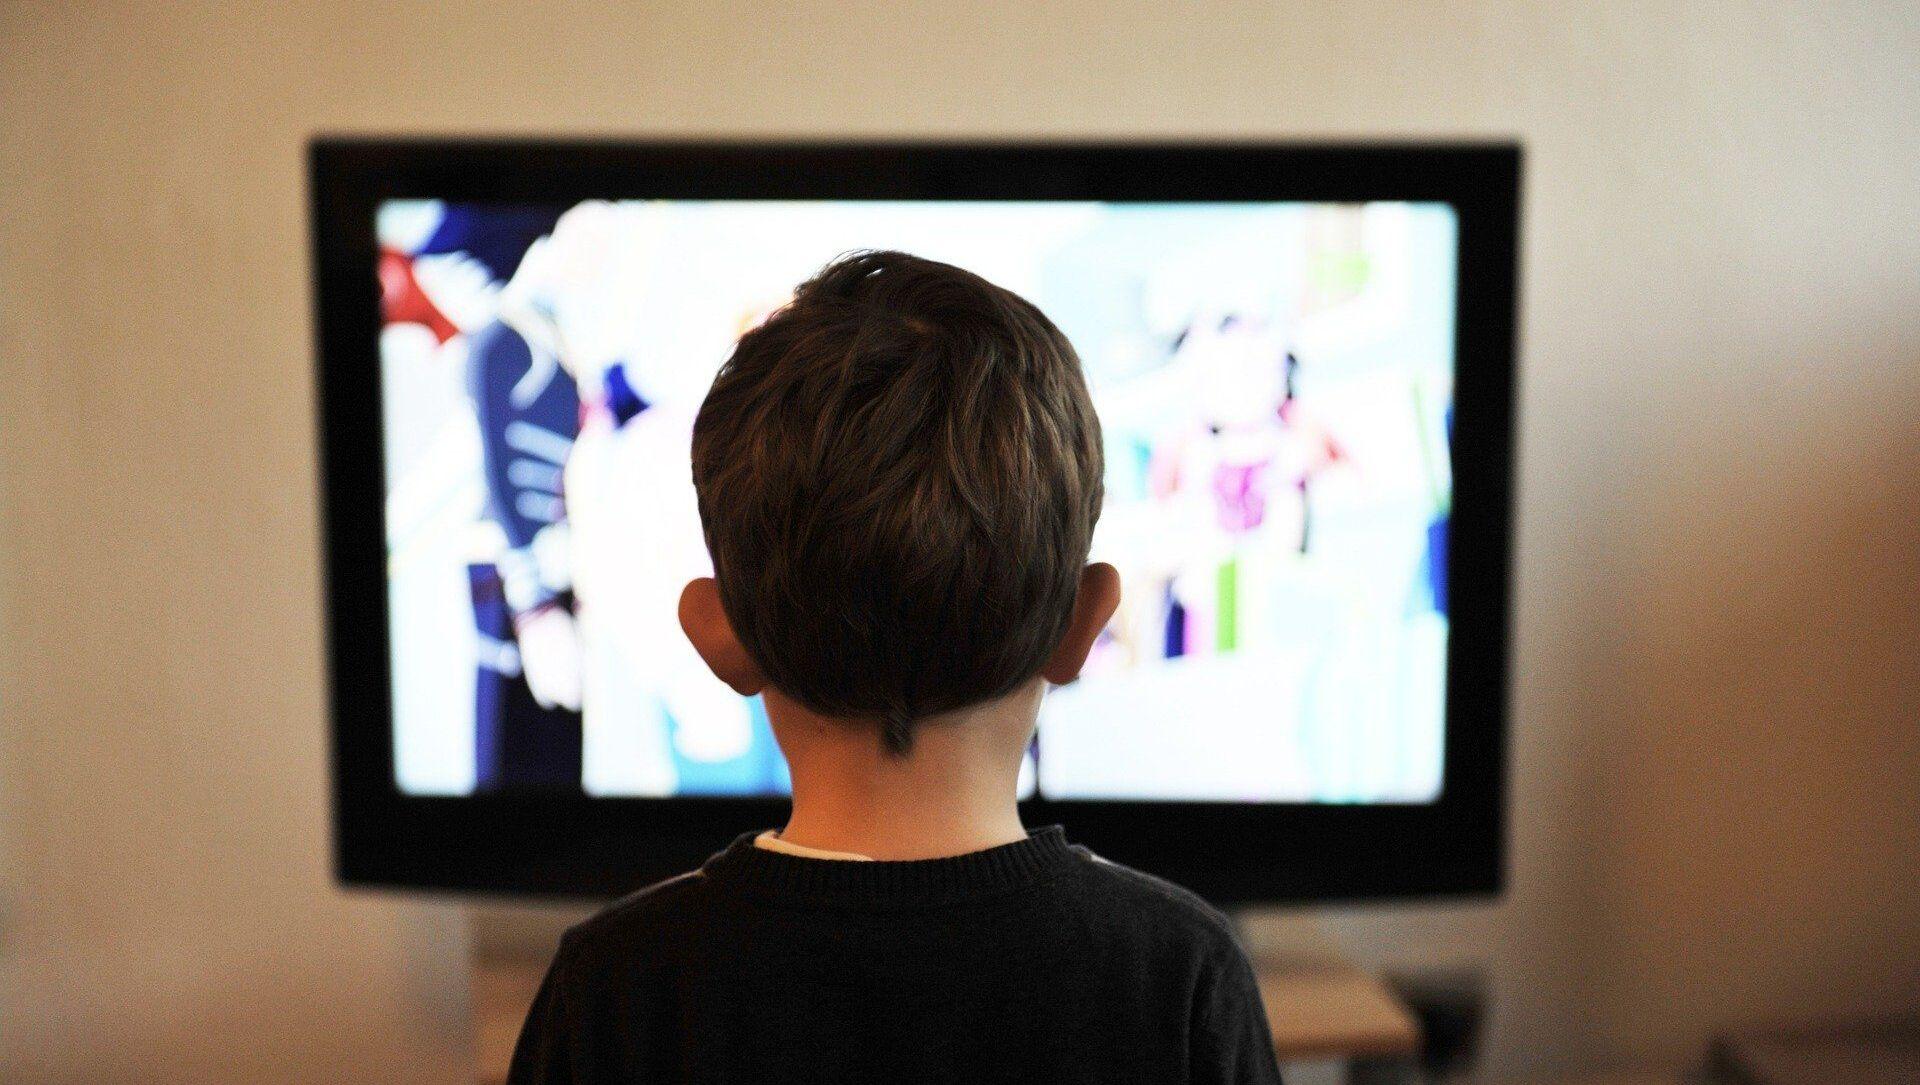 A child watching TV - Sputnik International, 1920, 30.07.2021